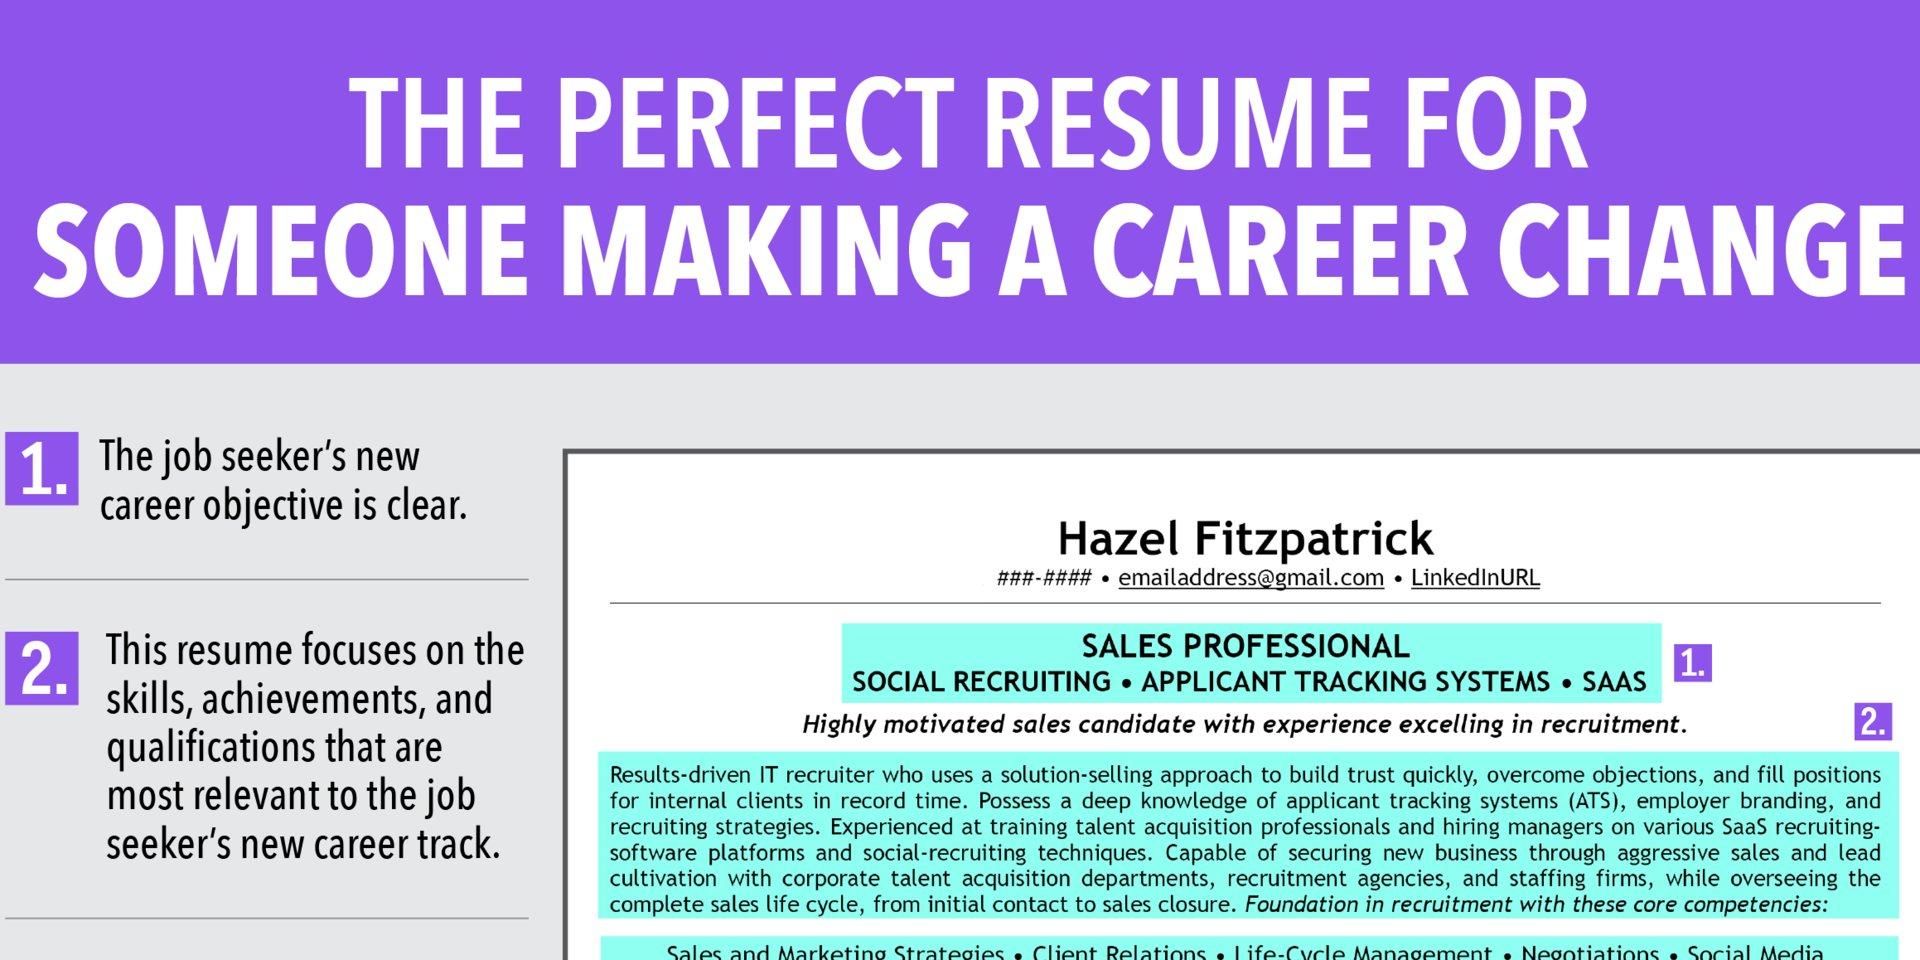 10 Stylish New Career Ideas At 30 30 beautiful career change resume sample free ideas at hirnsturm